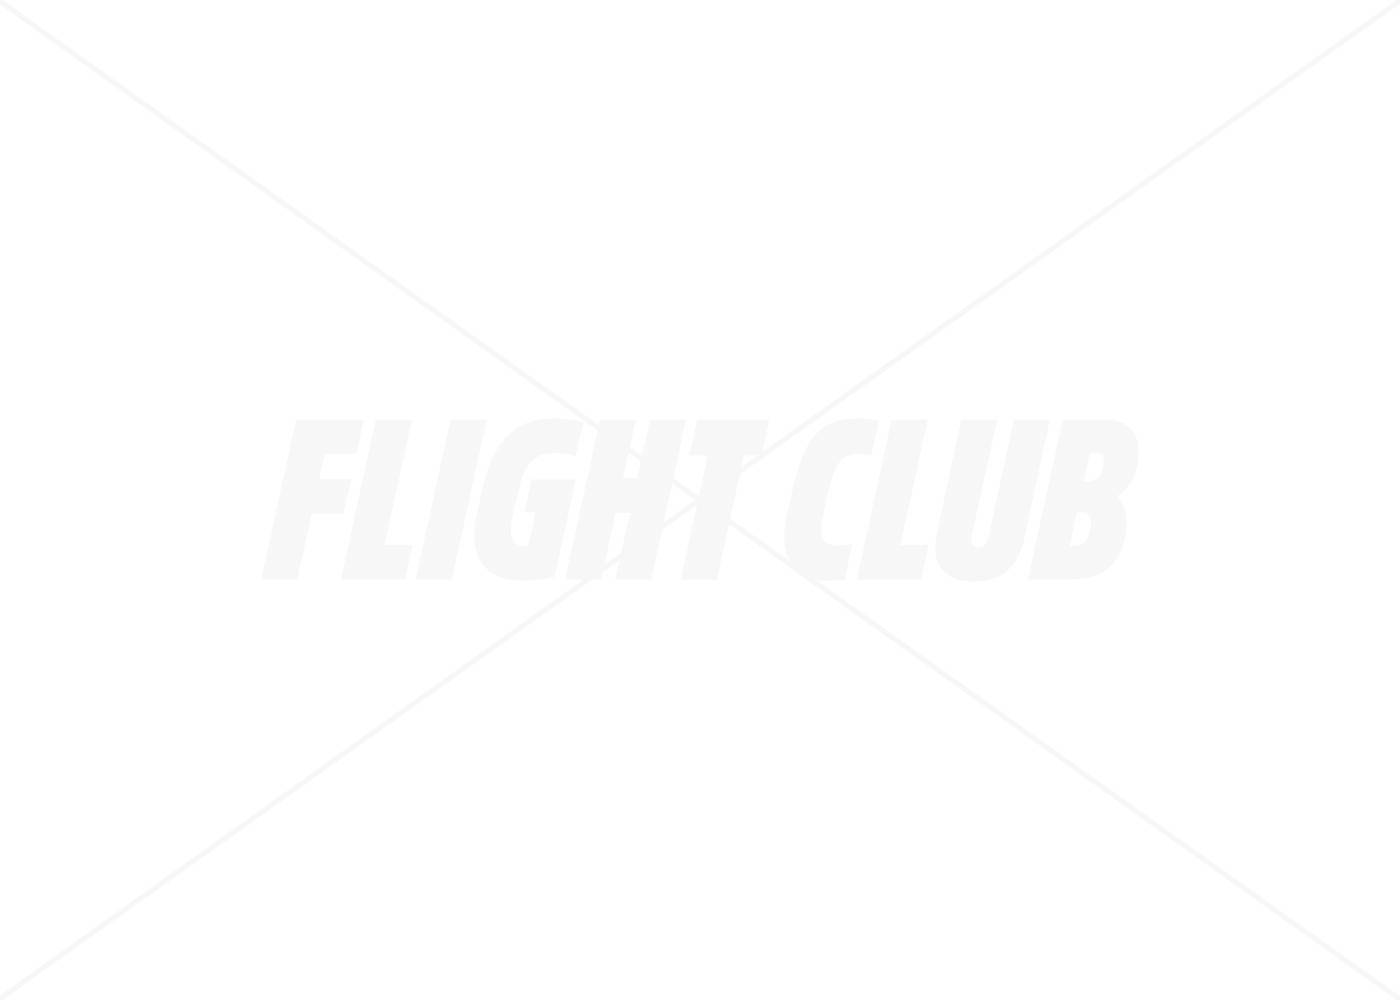 la meilleure attitude 554b2 37b19 nike sb air jordan 1 low qs